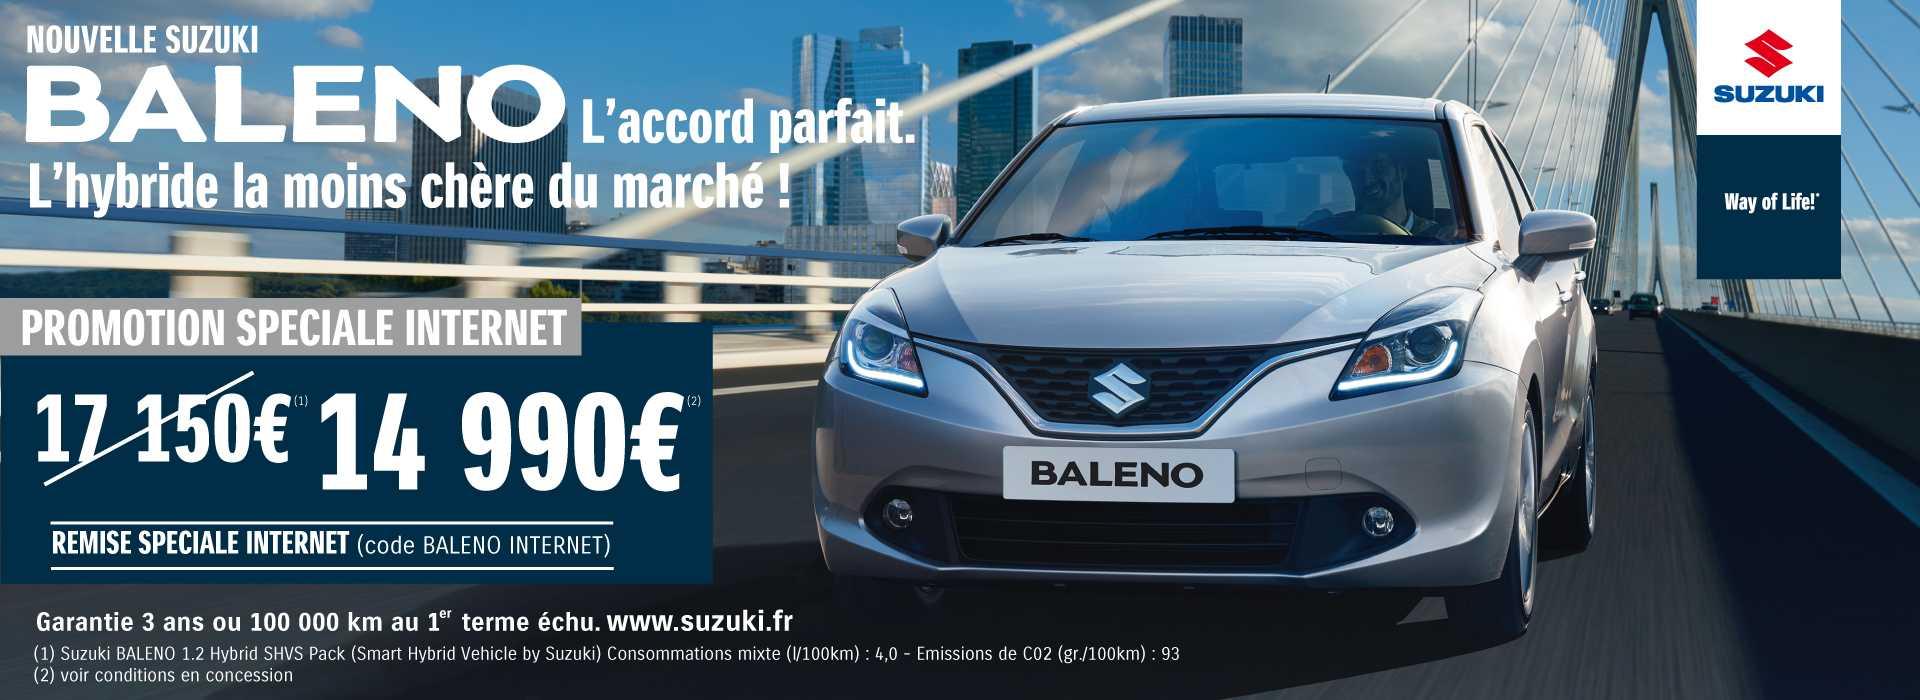 Suzuki nantes concessionnaire garage loire atlantique 44 for Garage volkswagen nantes orvault